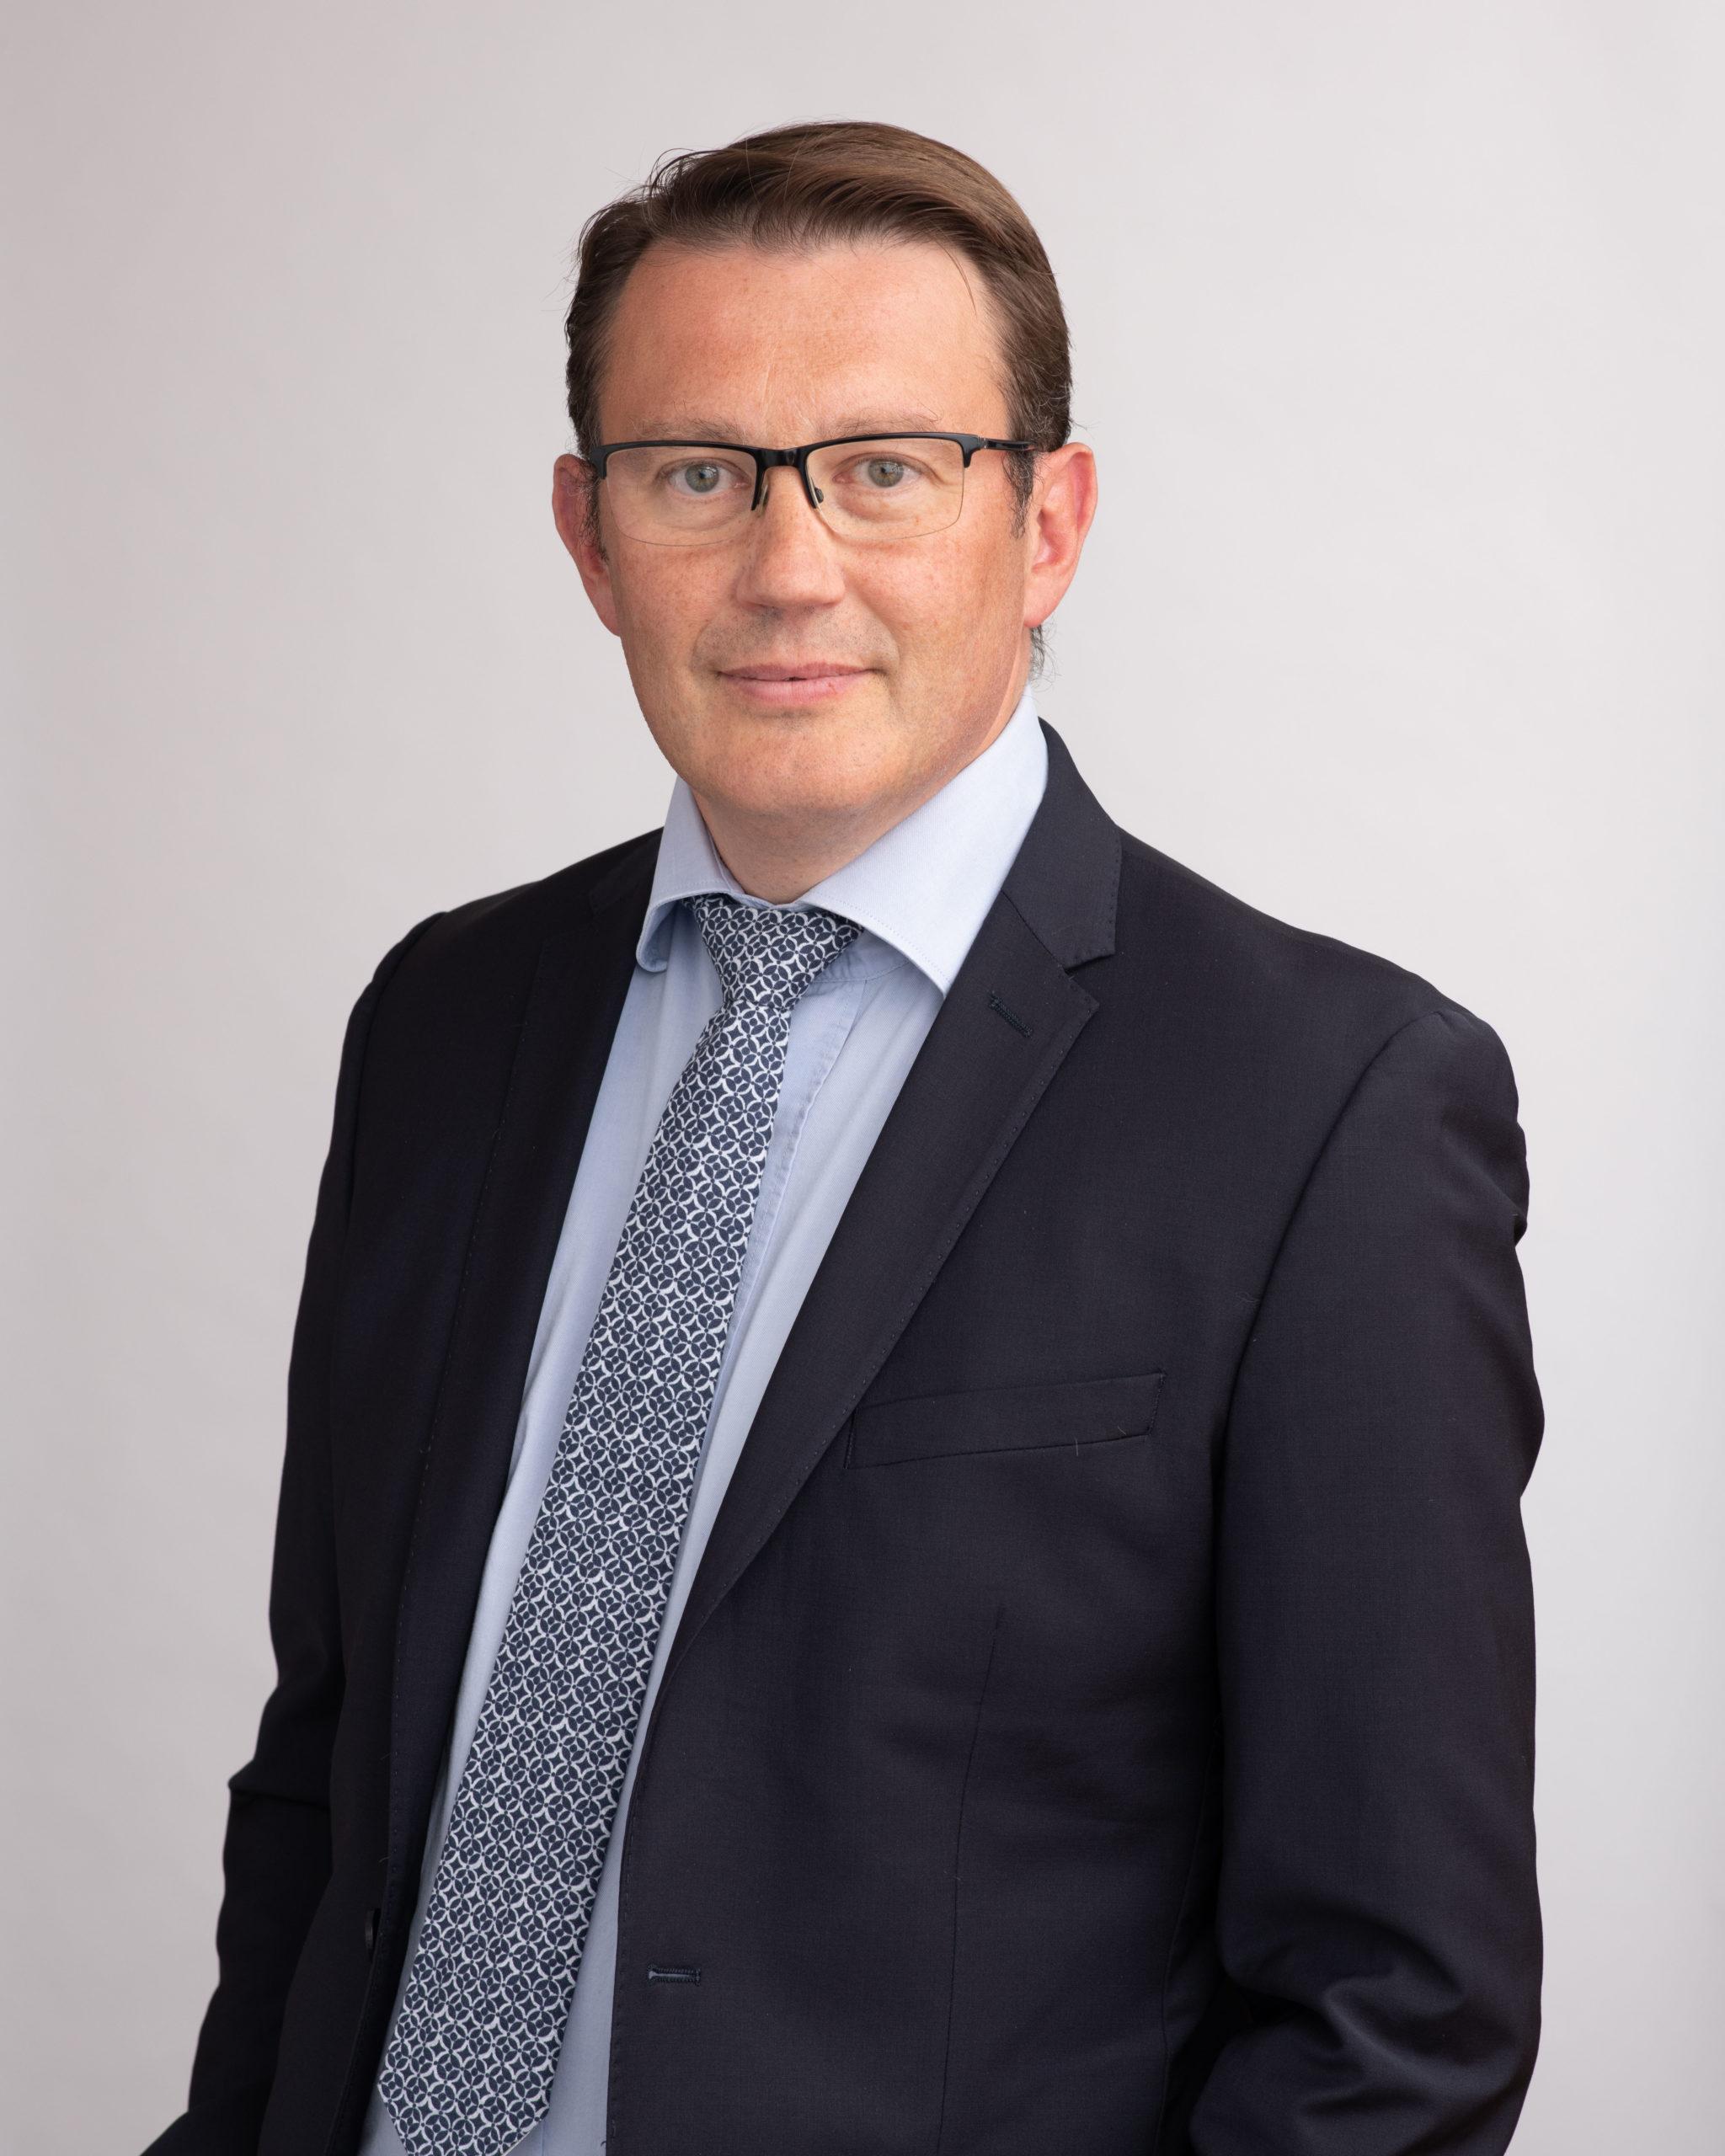 David Lescuyer